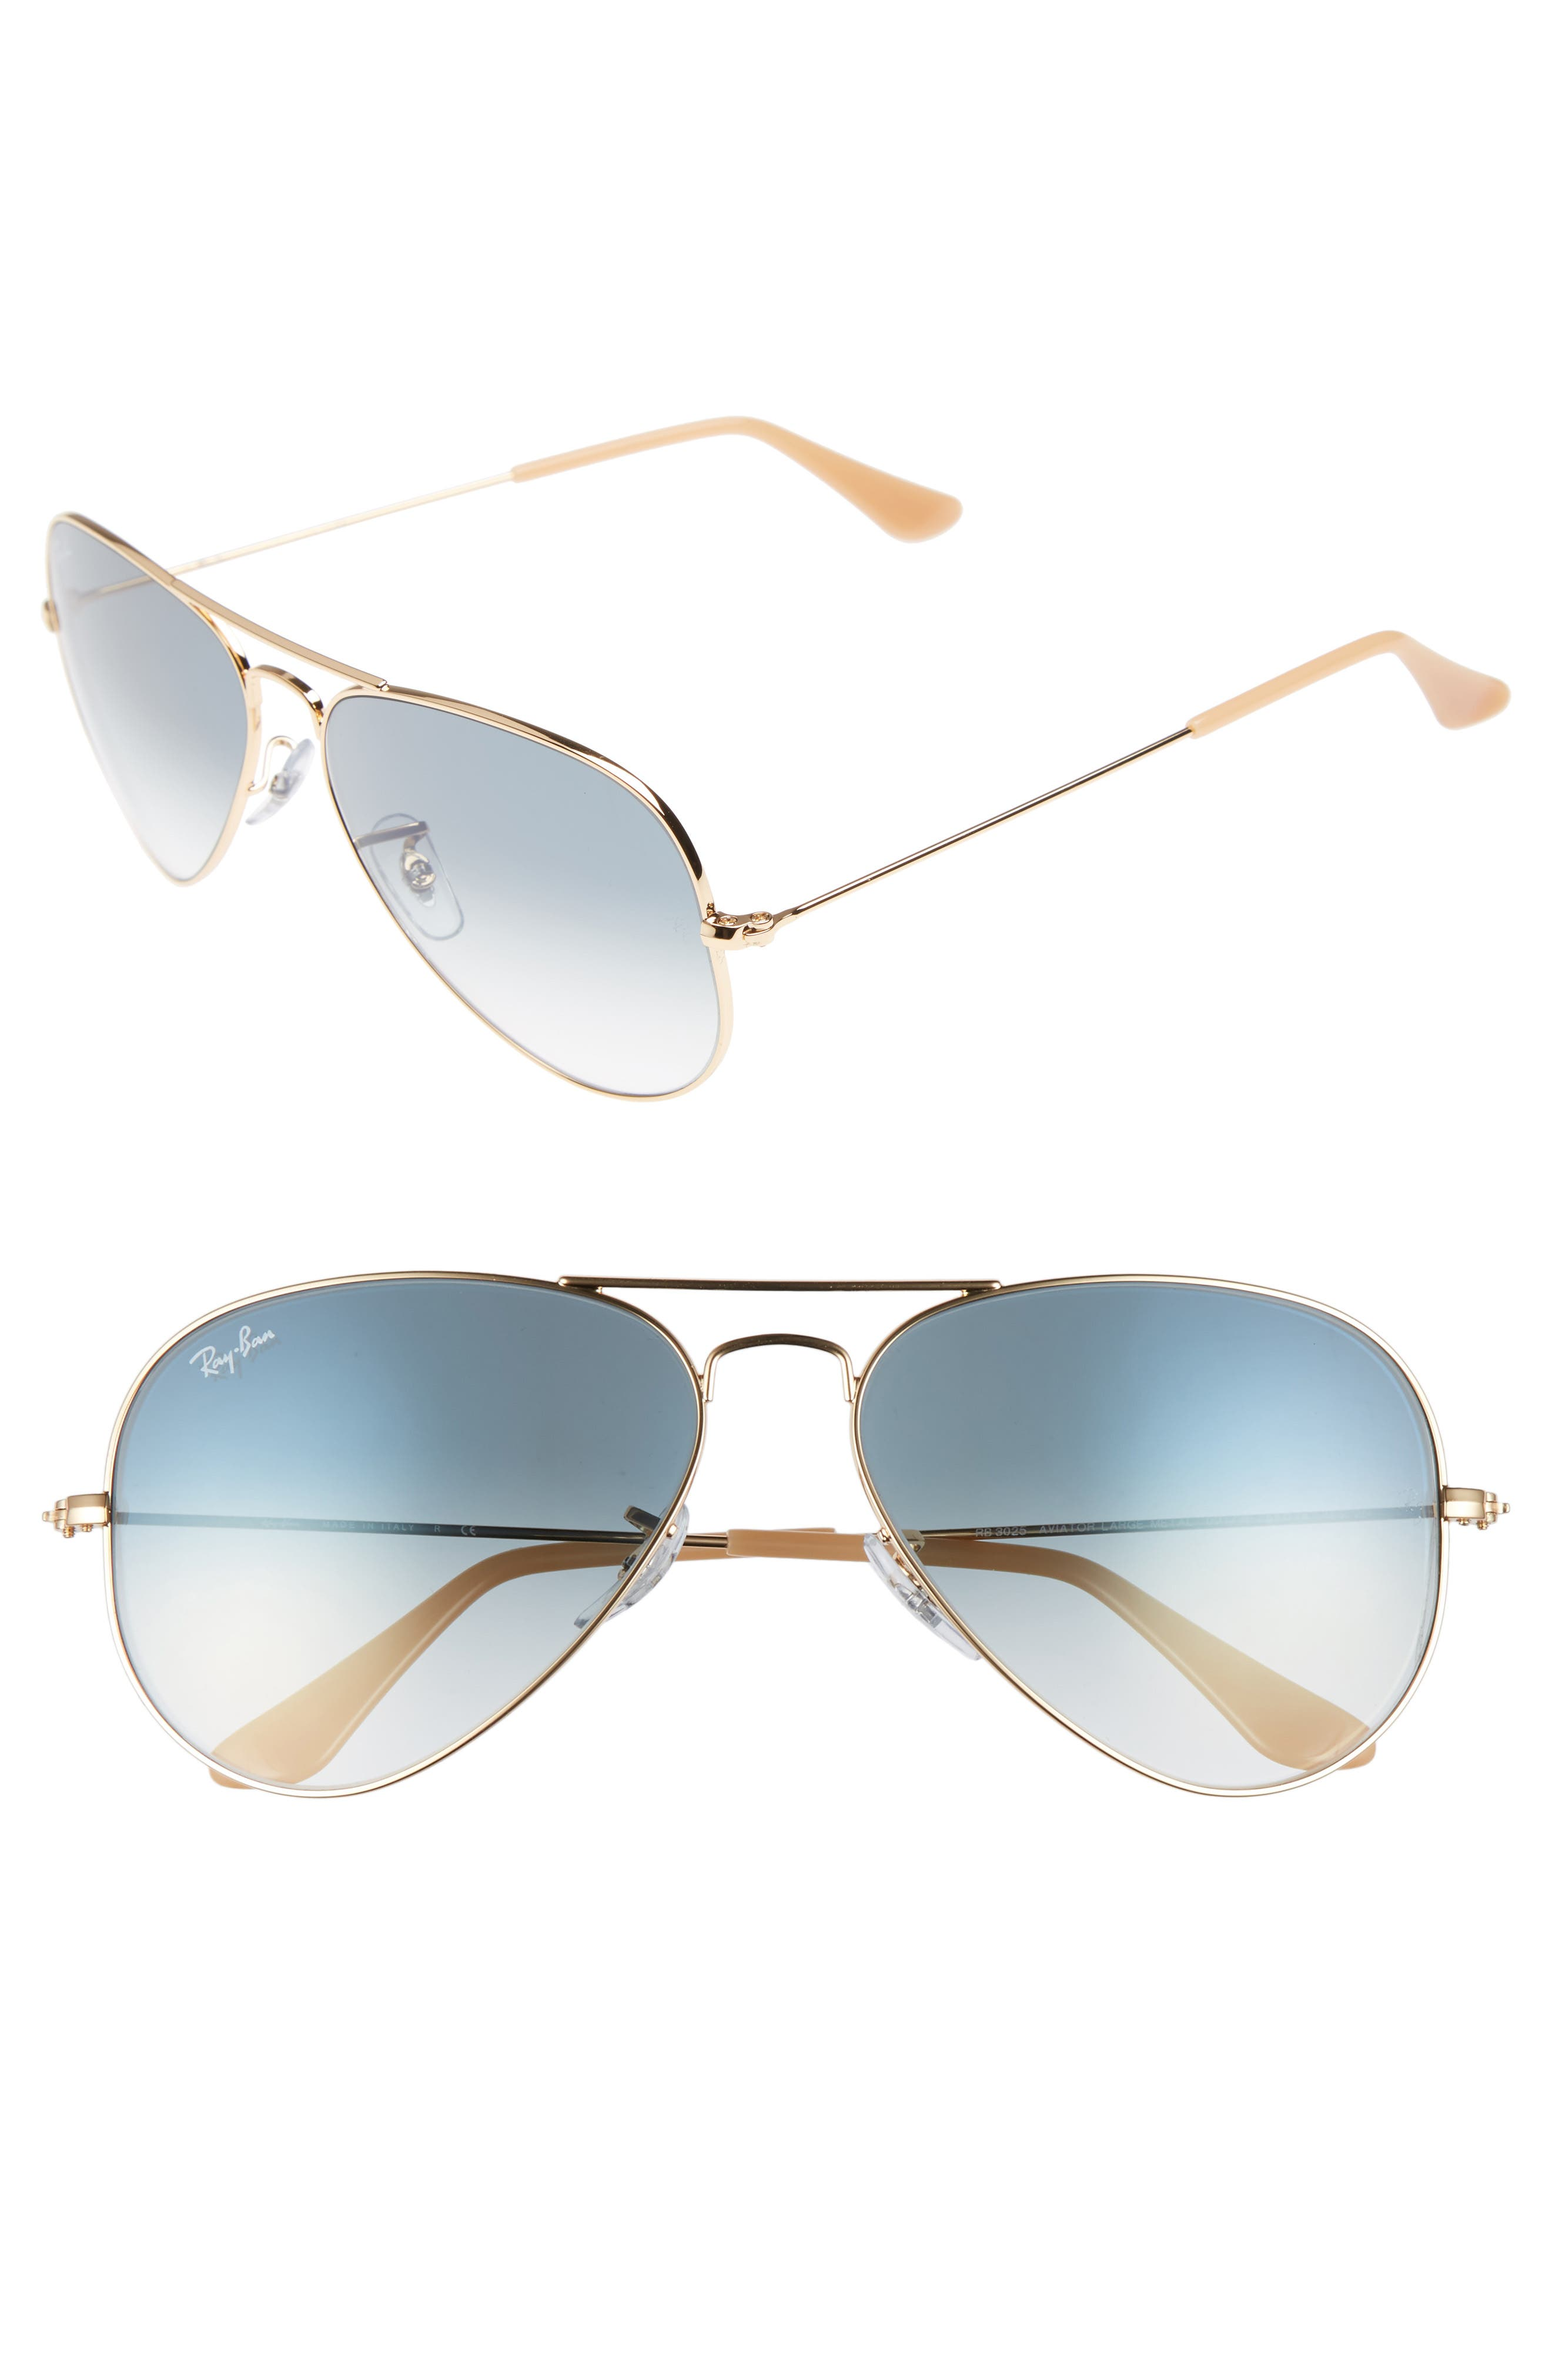 RAY-BAN Original Aviator 58mm Sunglasses, Main, color, MATTE GOLD/ BLUE MIRROR